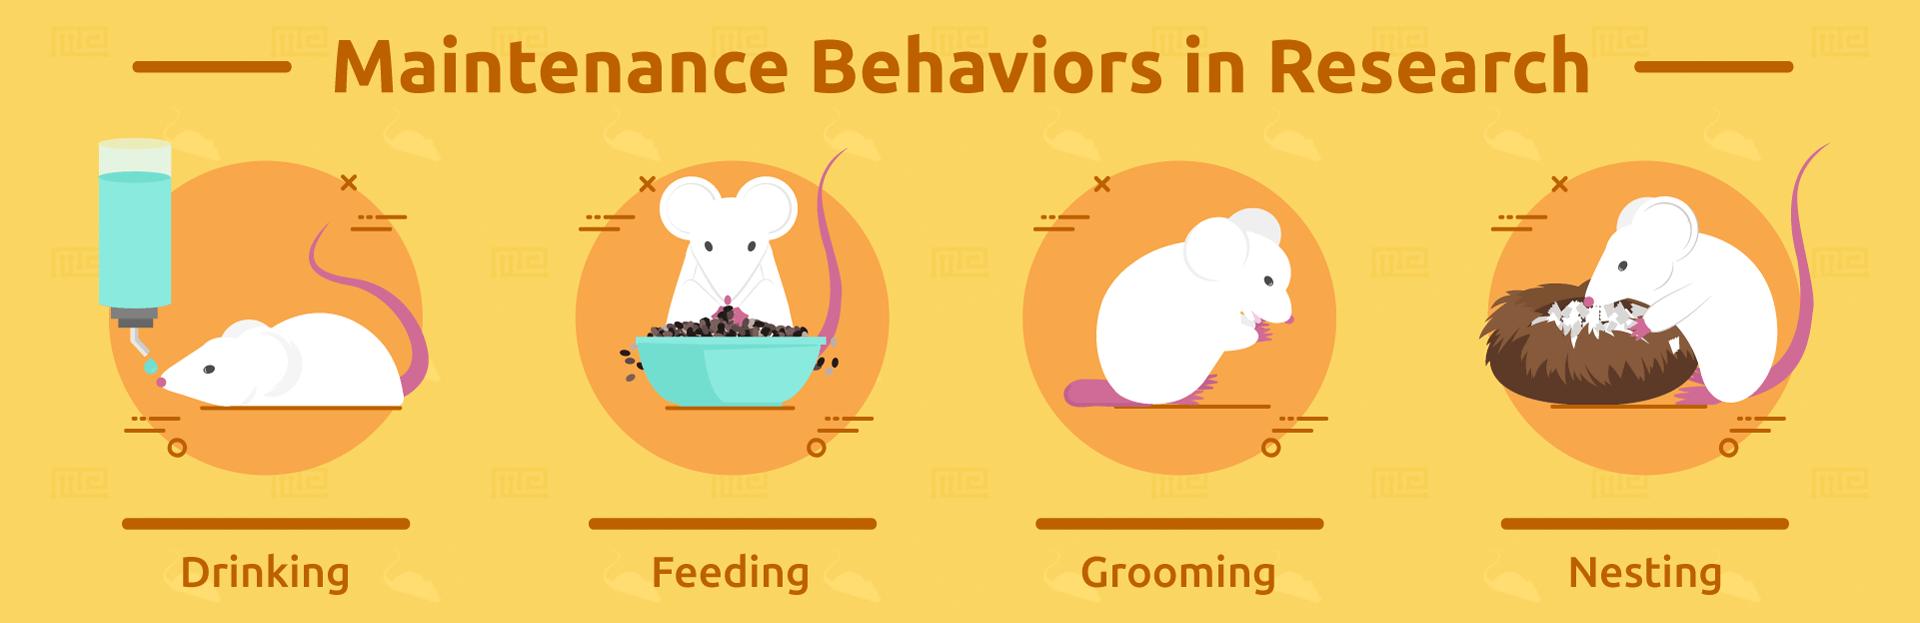 Maintenance-Behaviors-in-Research